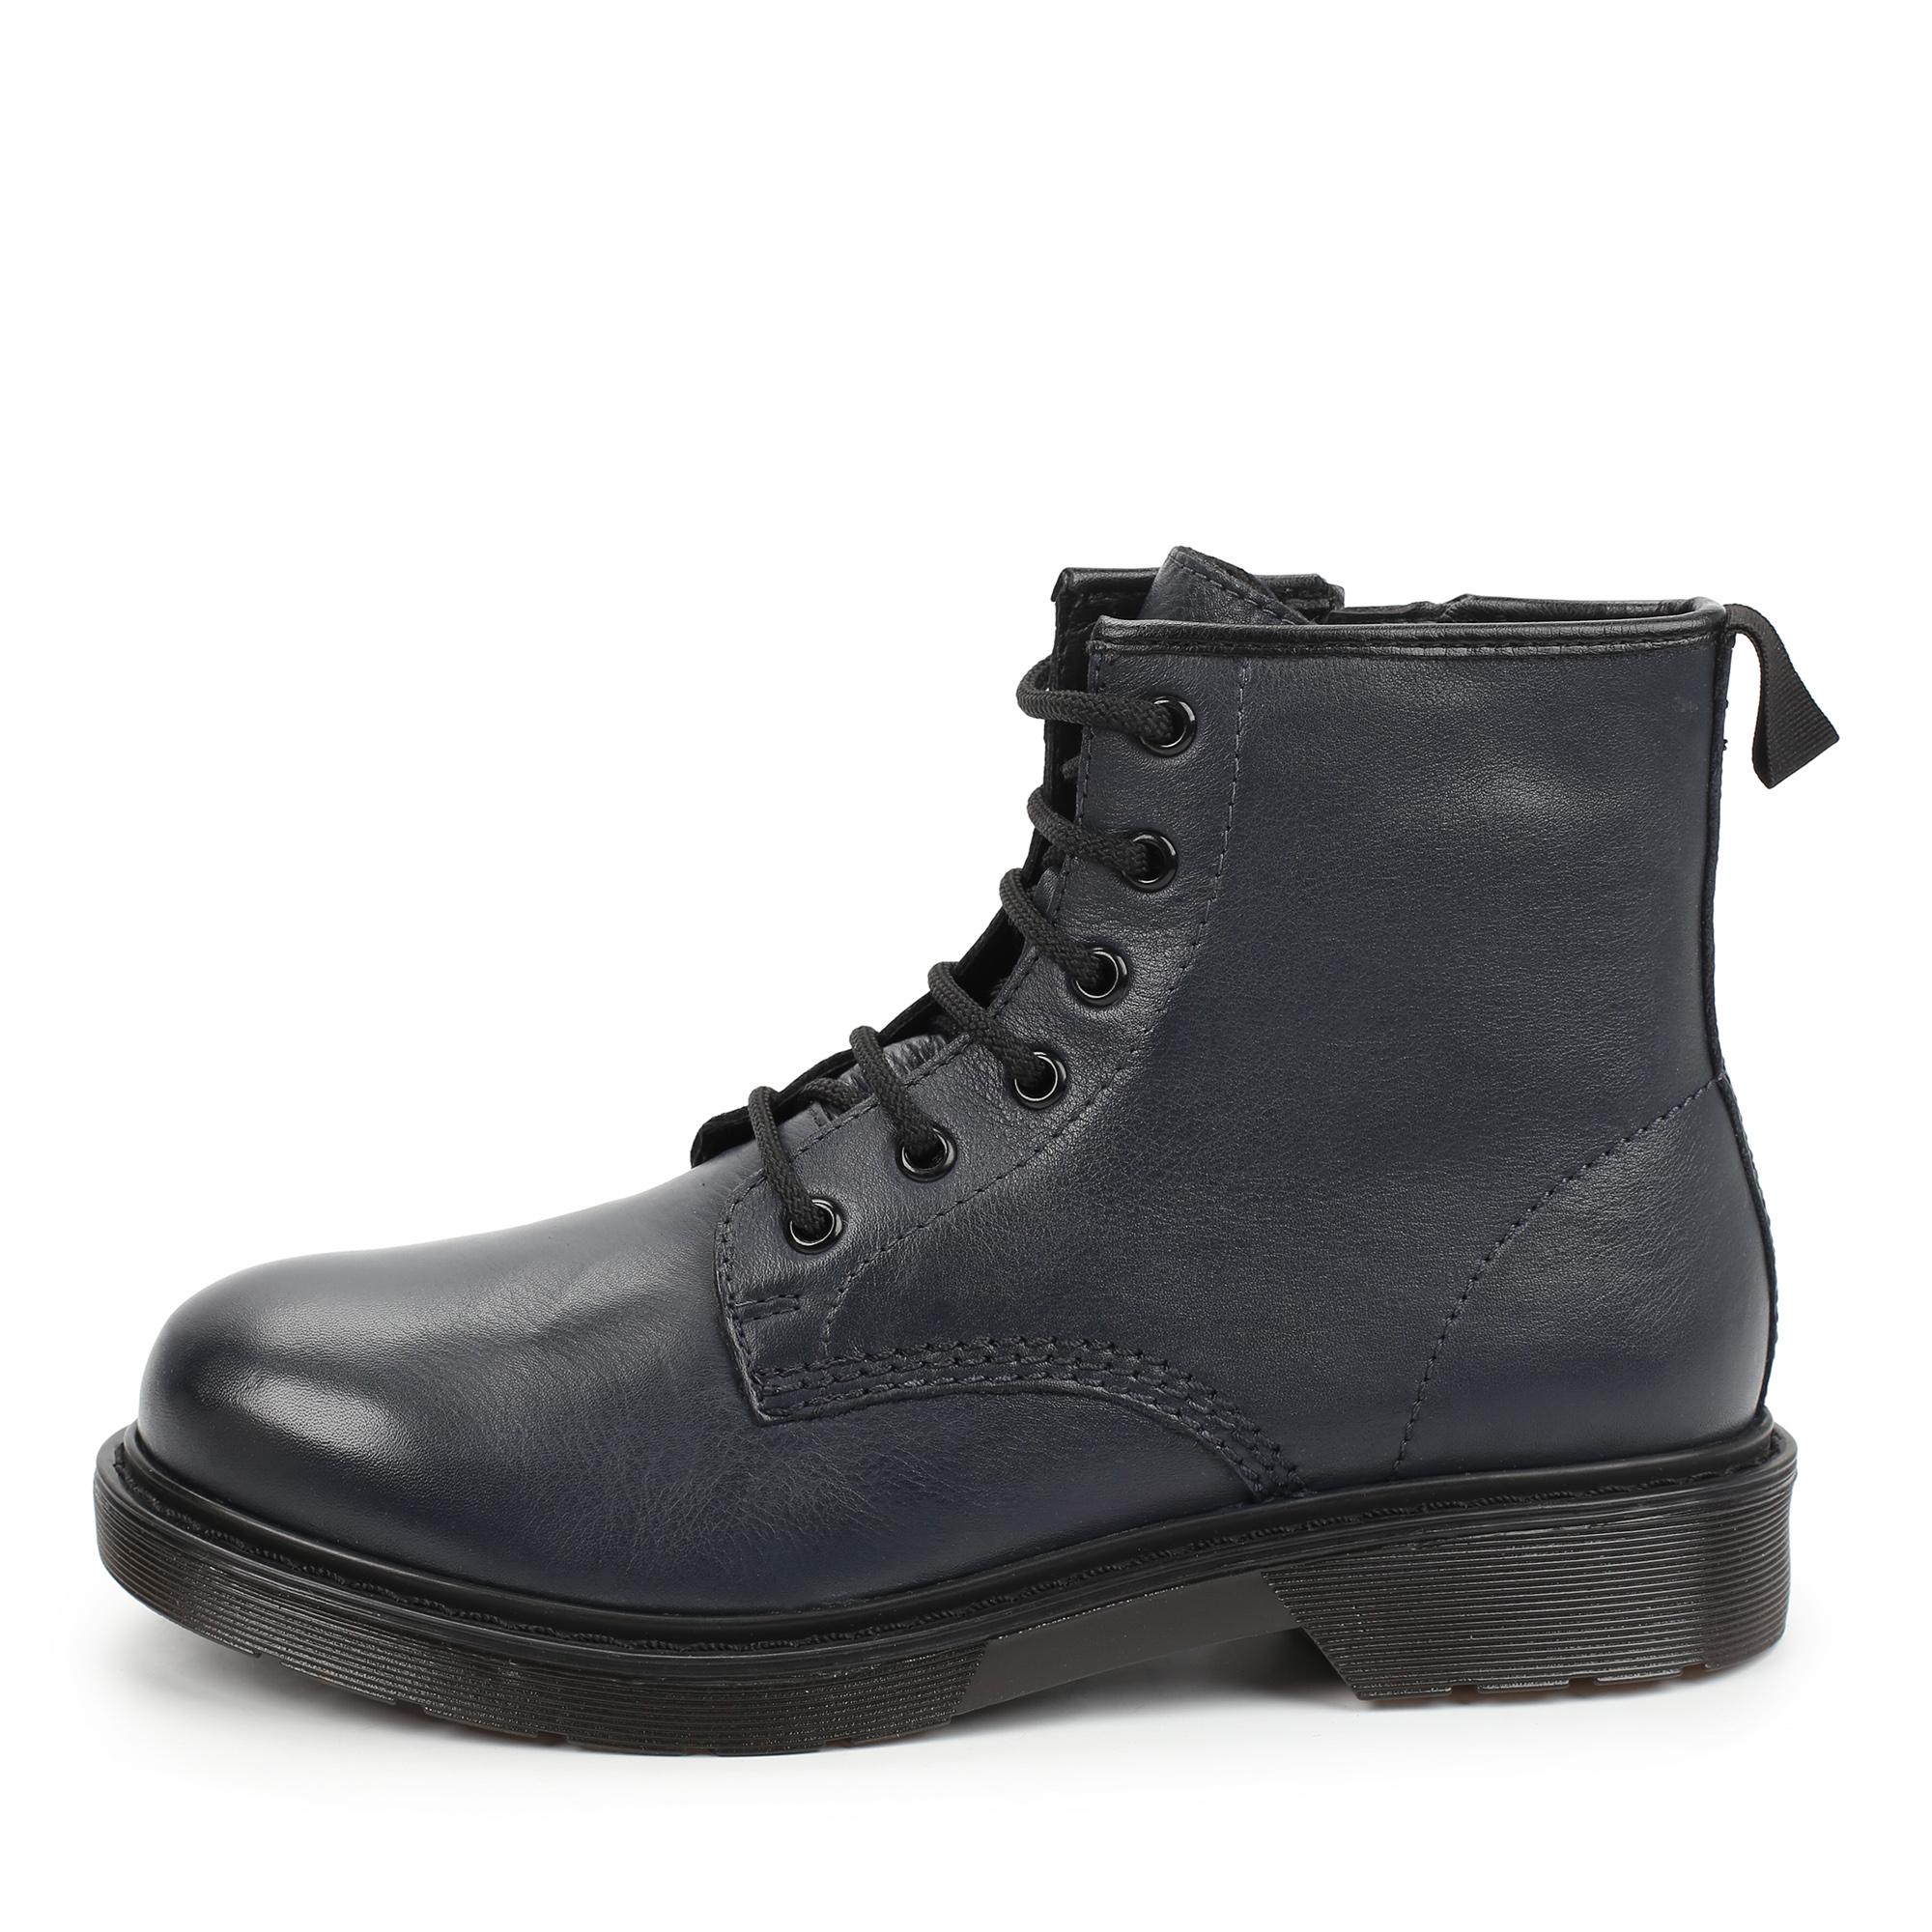 Ботинки Thomas Munz 569-143A-6103